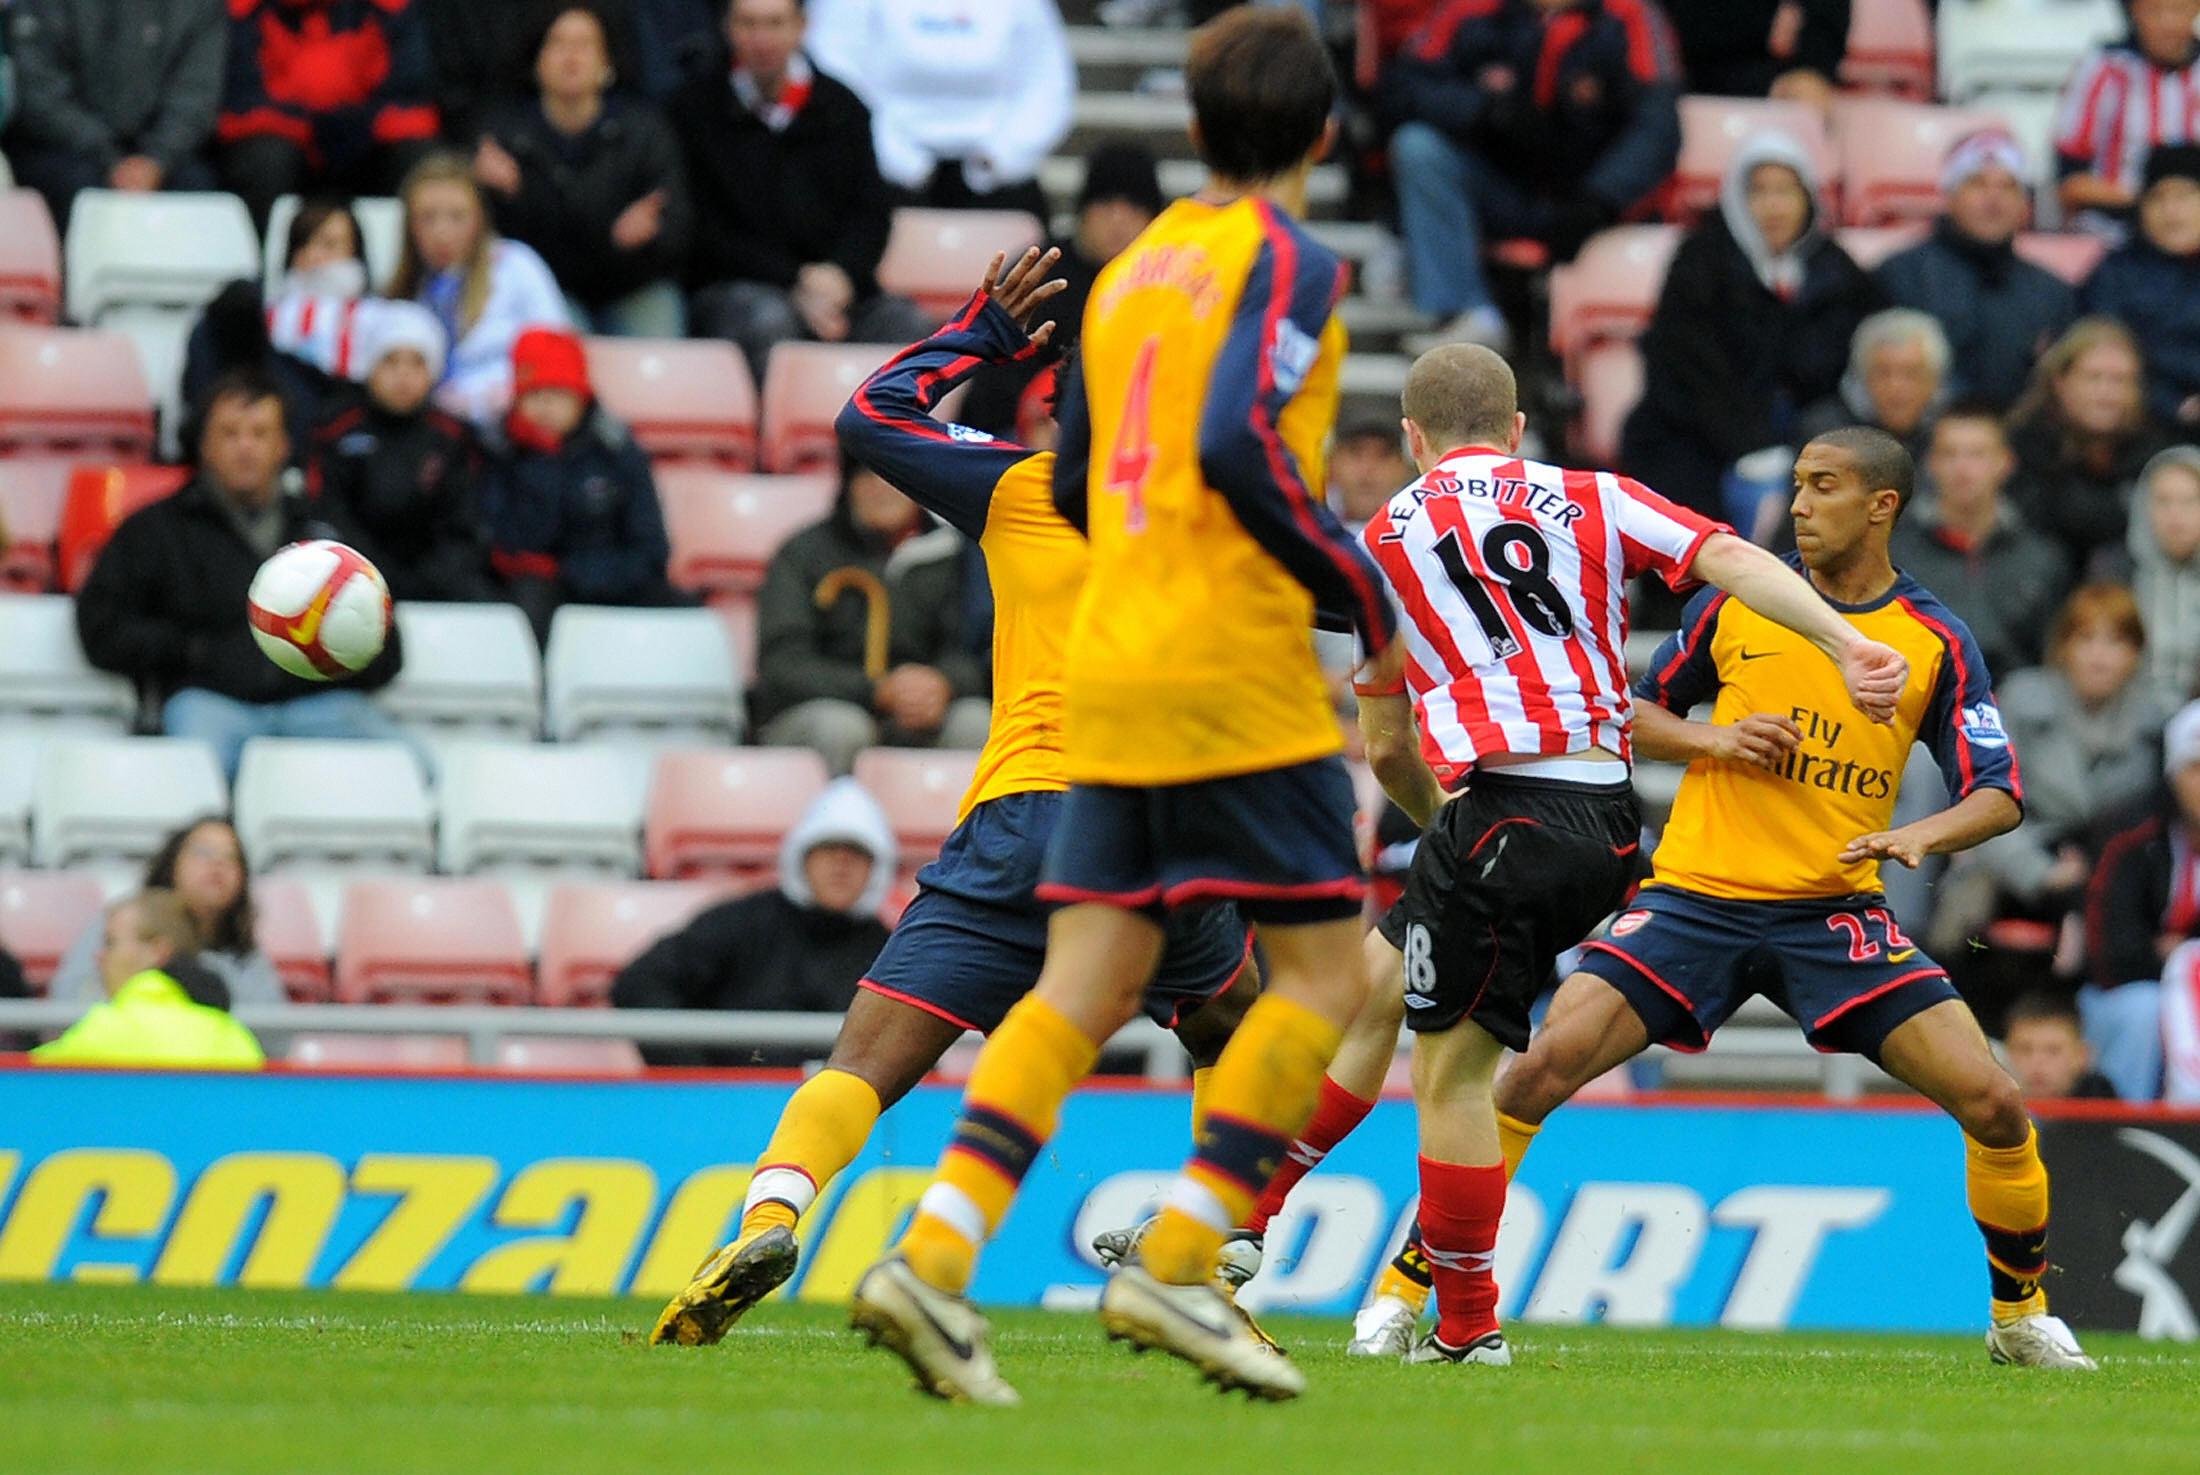 Sunderland's English midfielder Grant Le